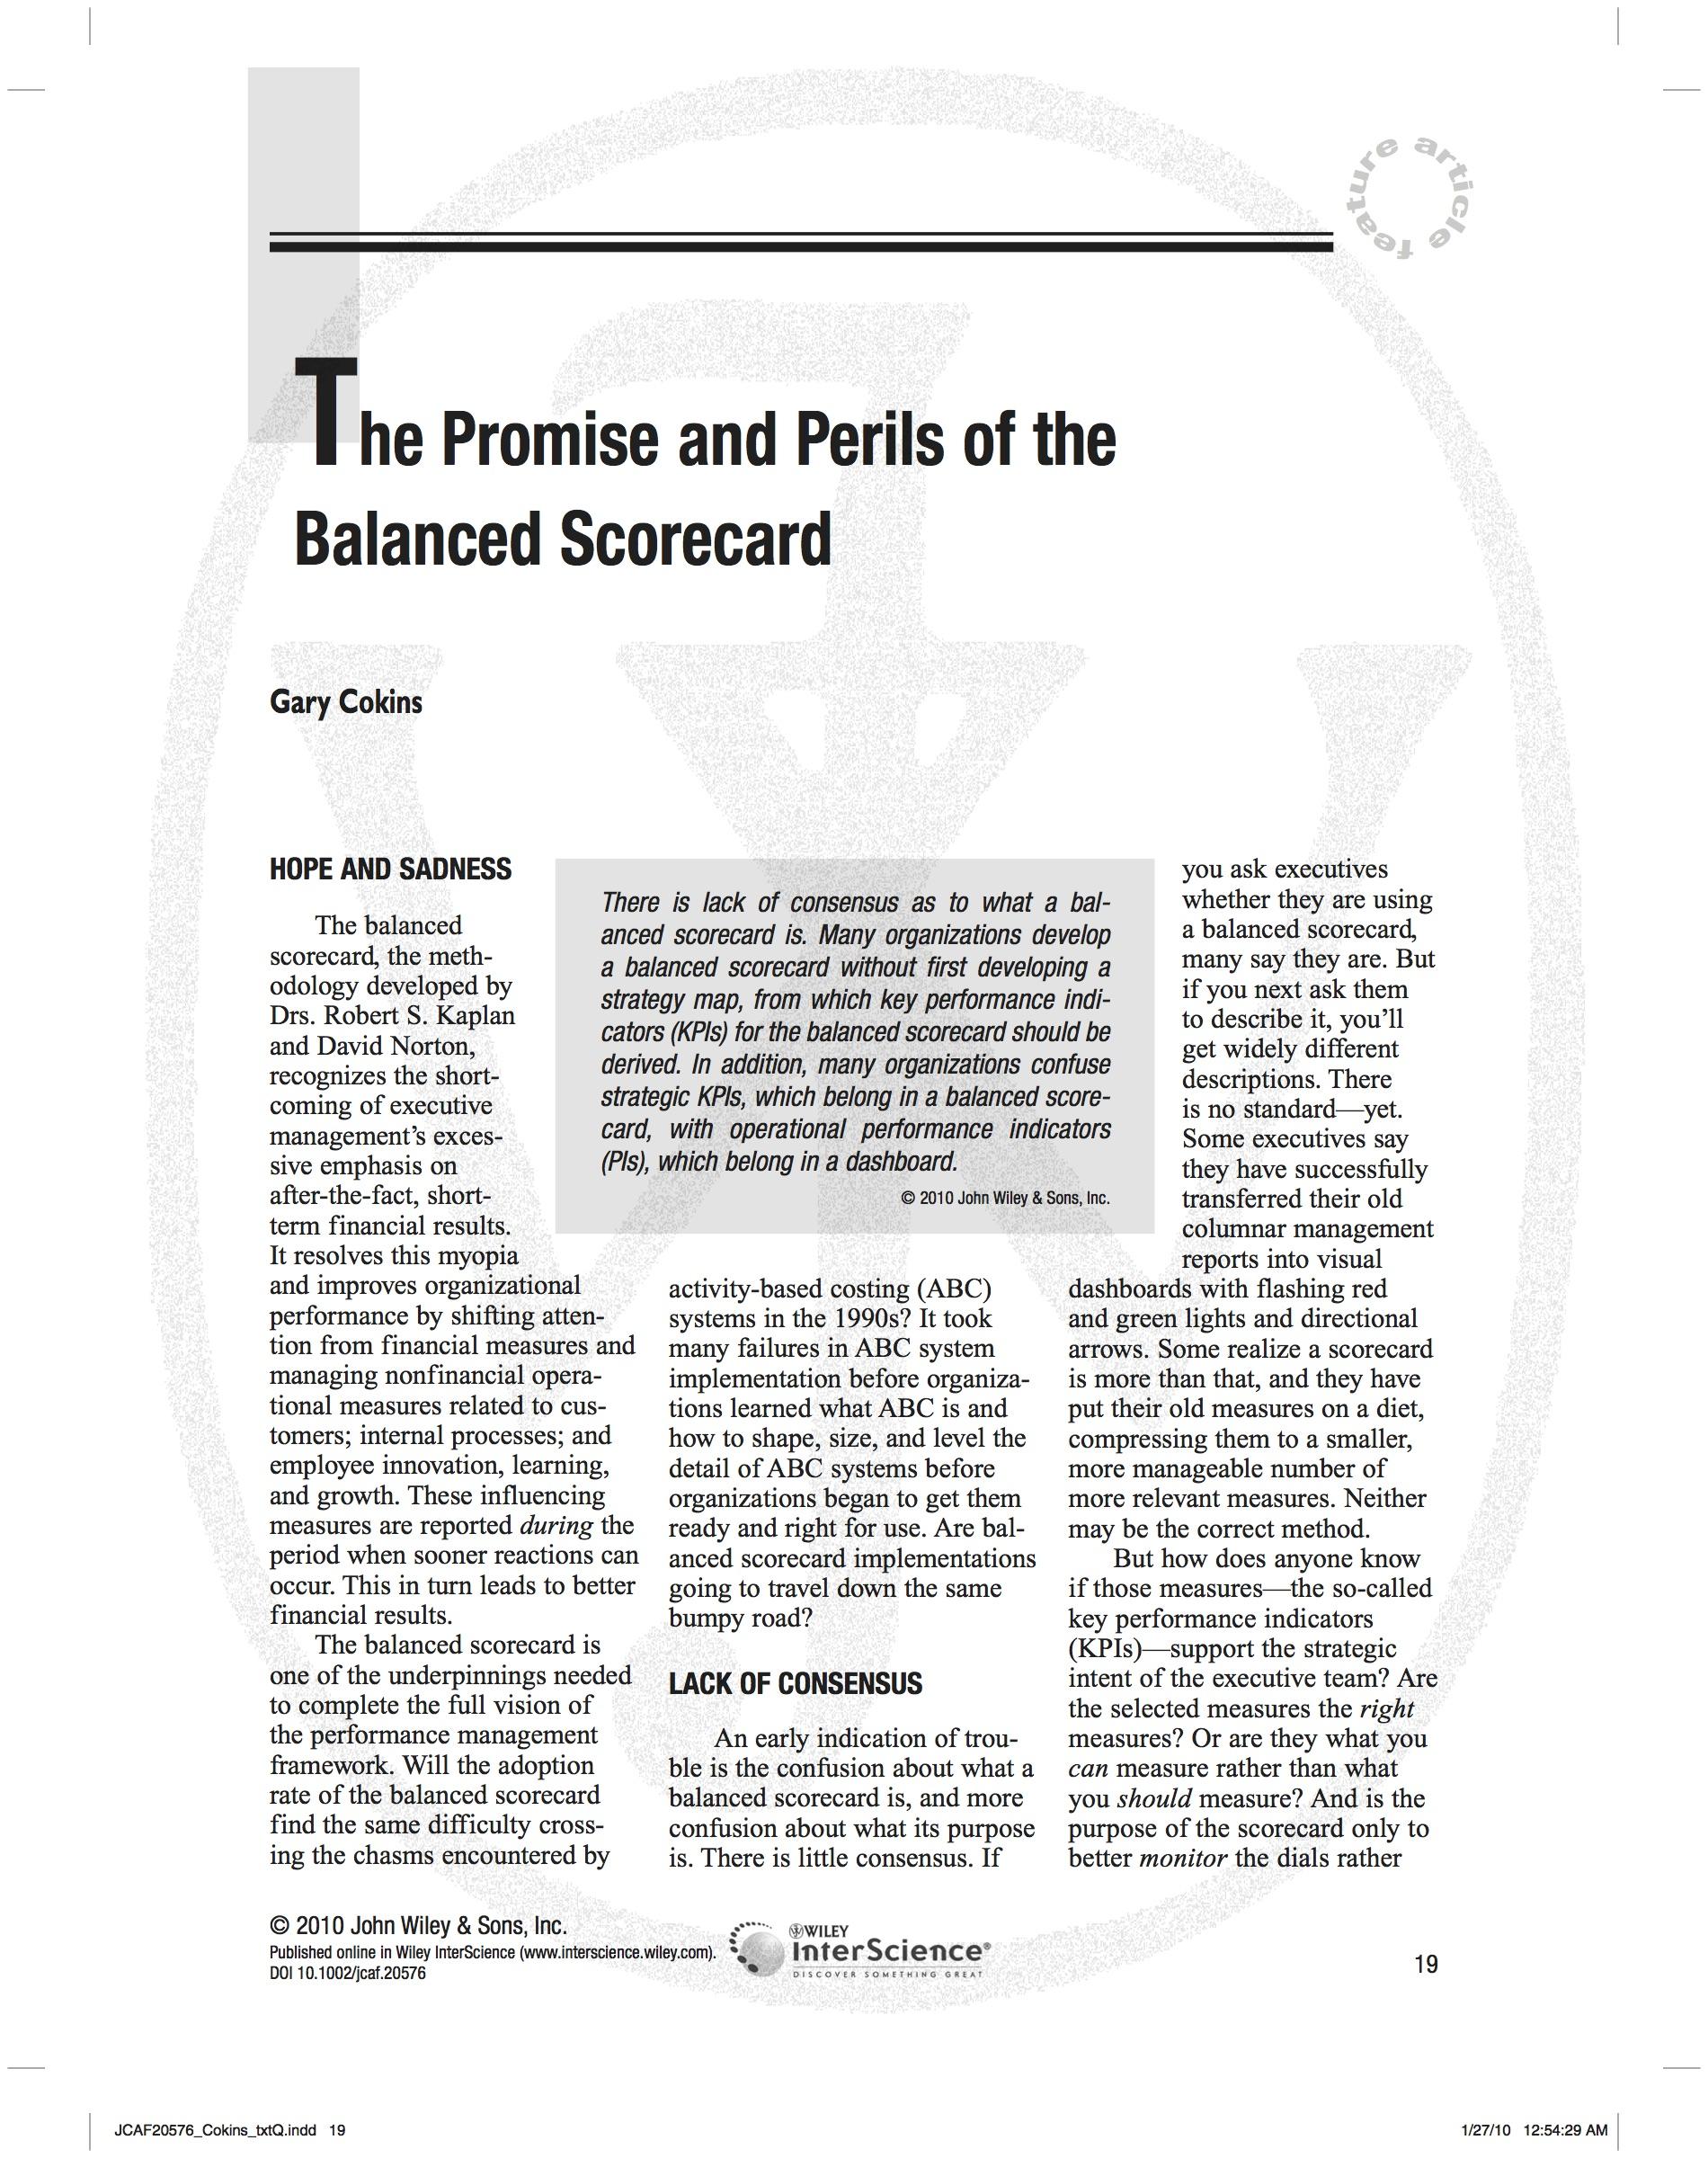 The Promise and Perils of Balanced Scorecard